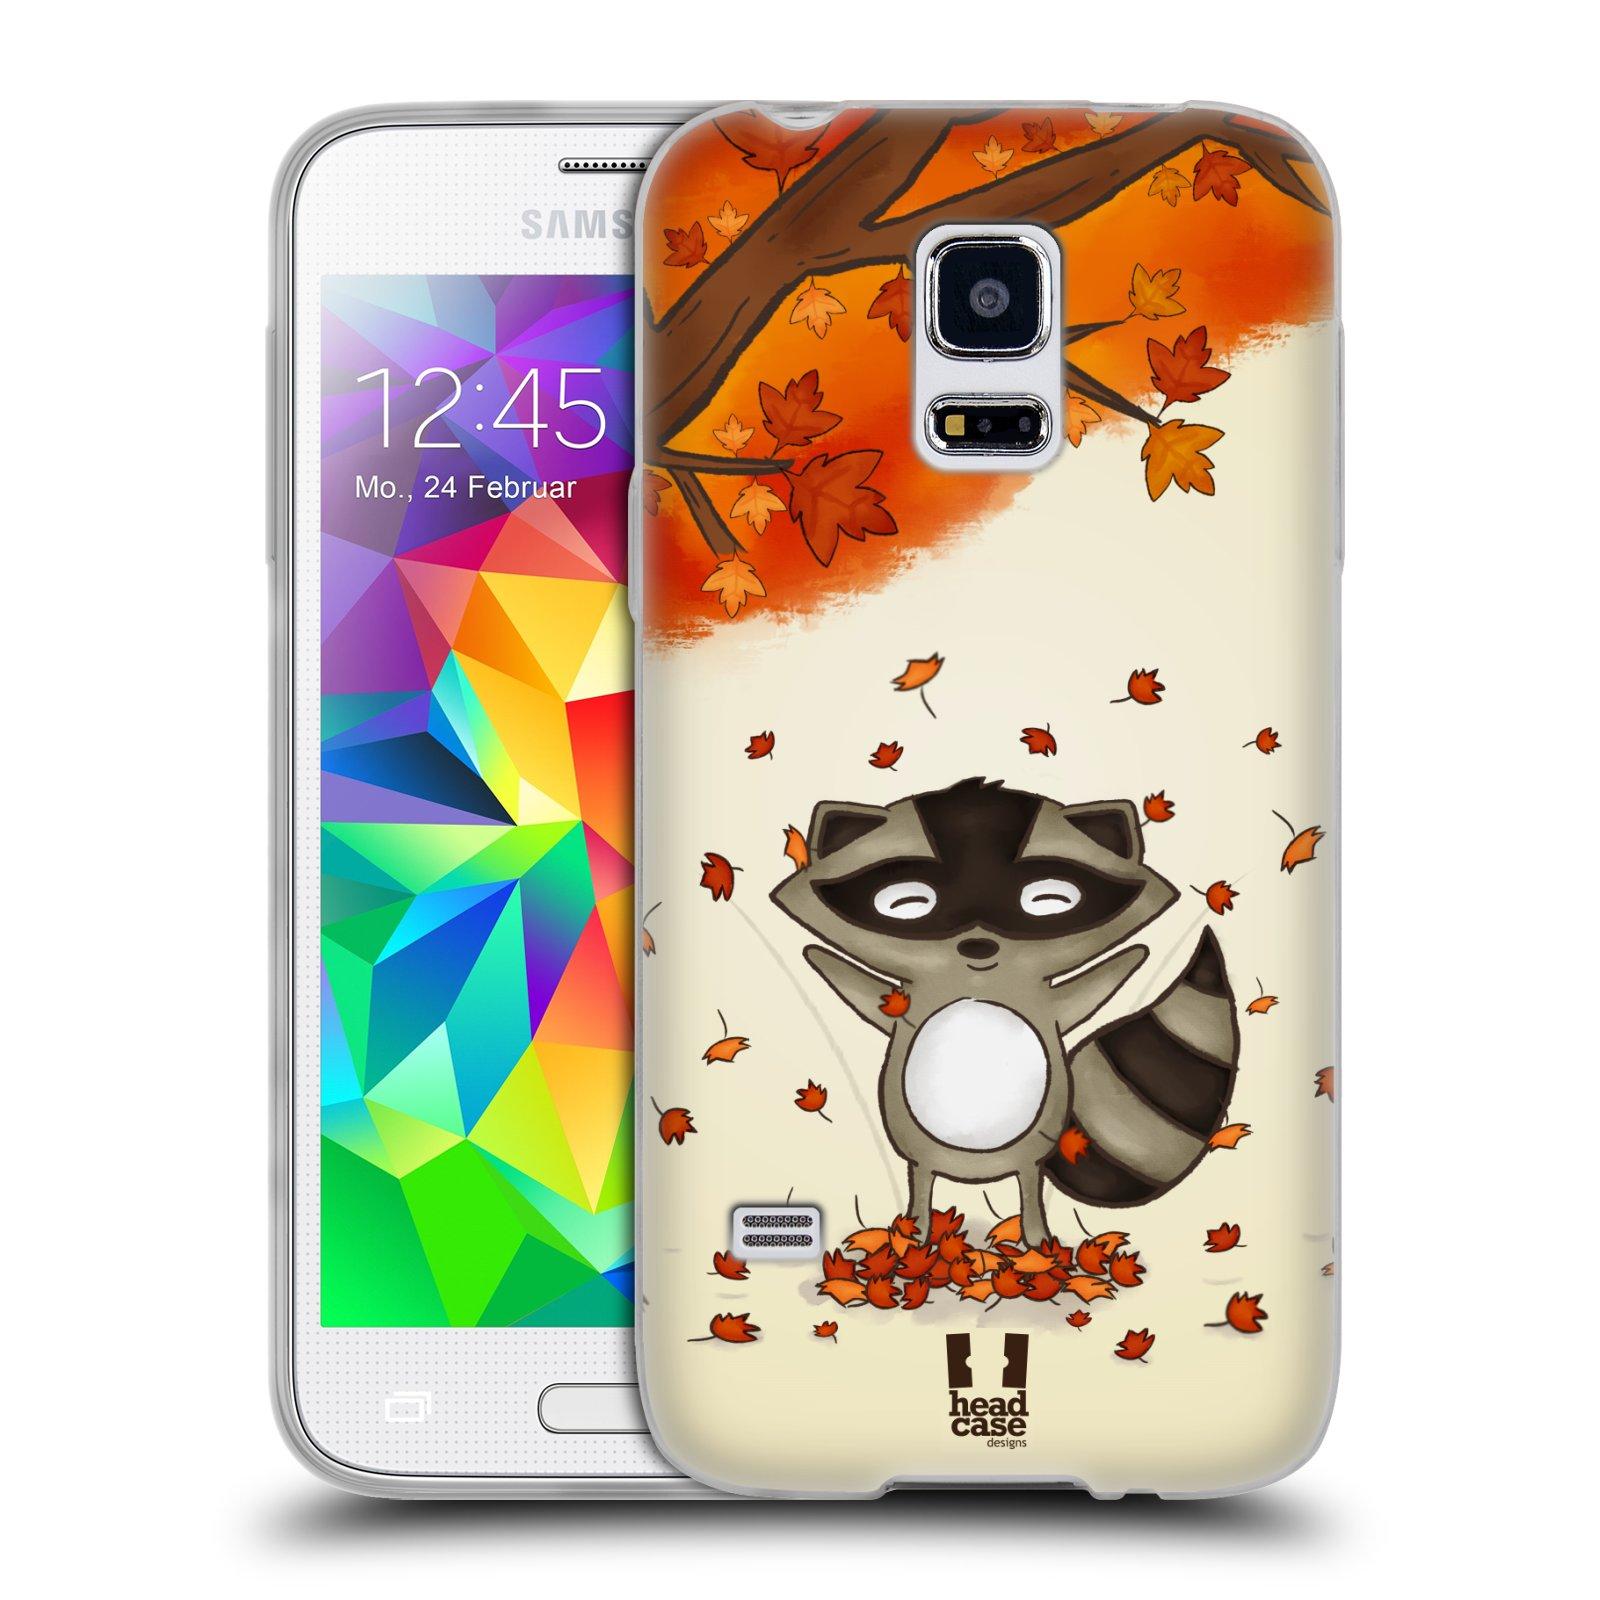 HEAD CASE silikonový obal na mobil Samsung Galaxy S5 MINI vzor podzimní zvířátka mýval